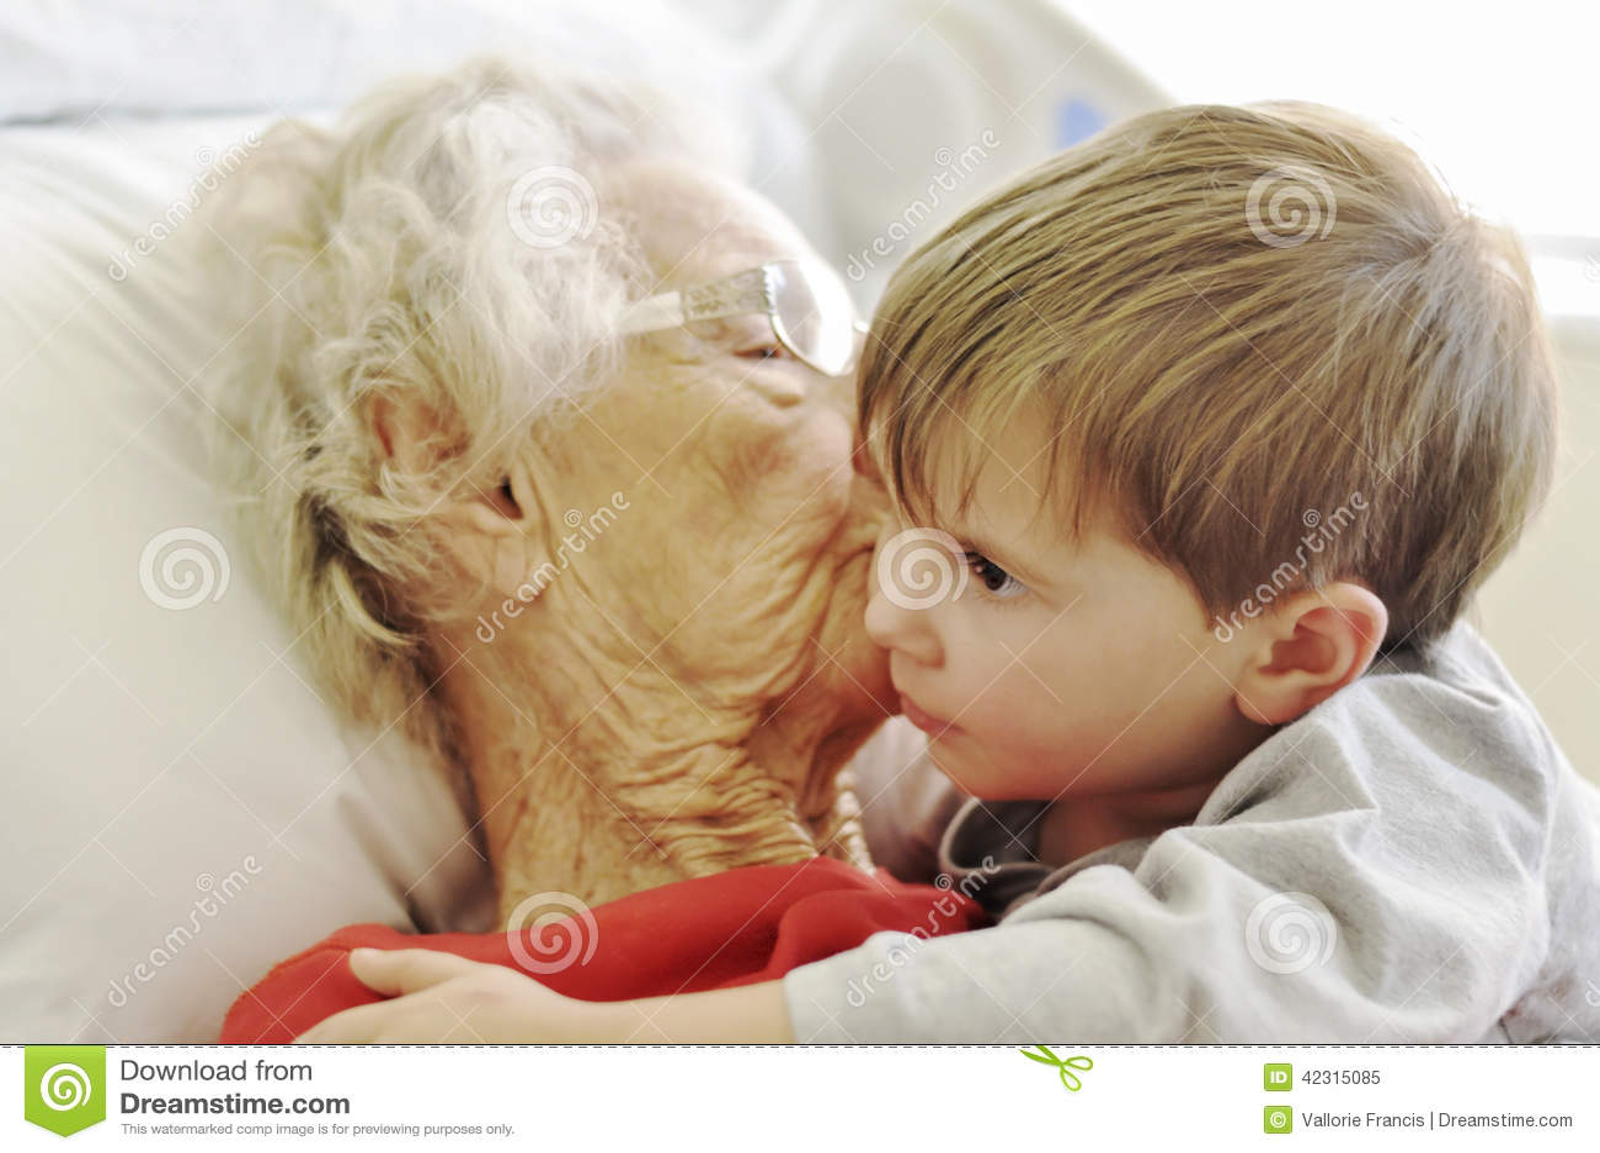 Visiting grandma in the hospital